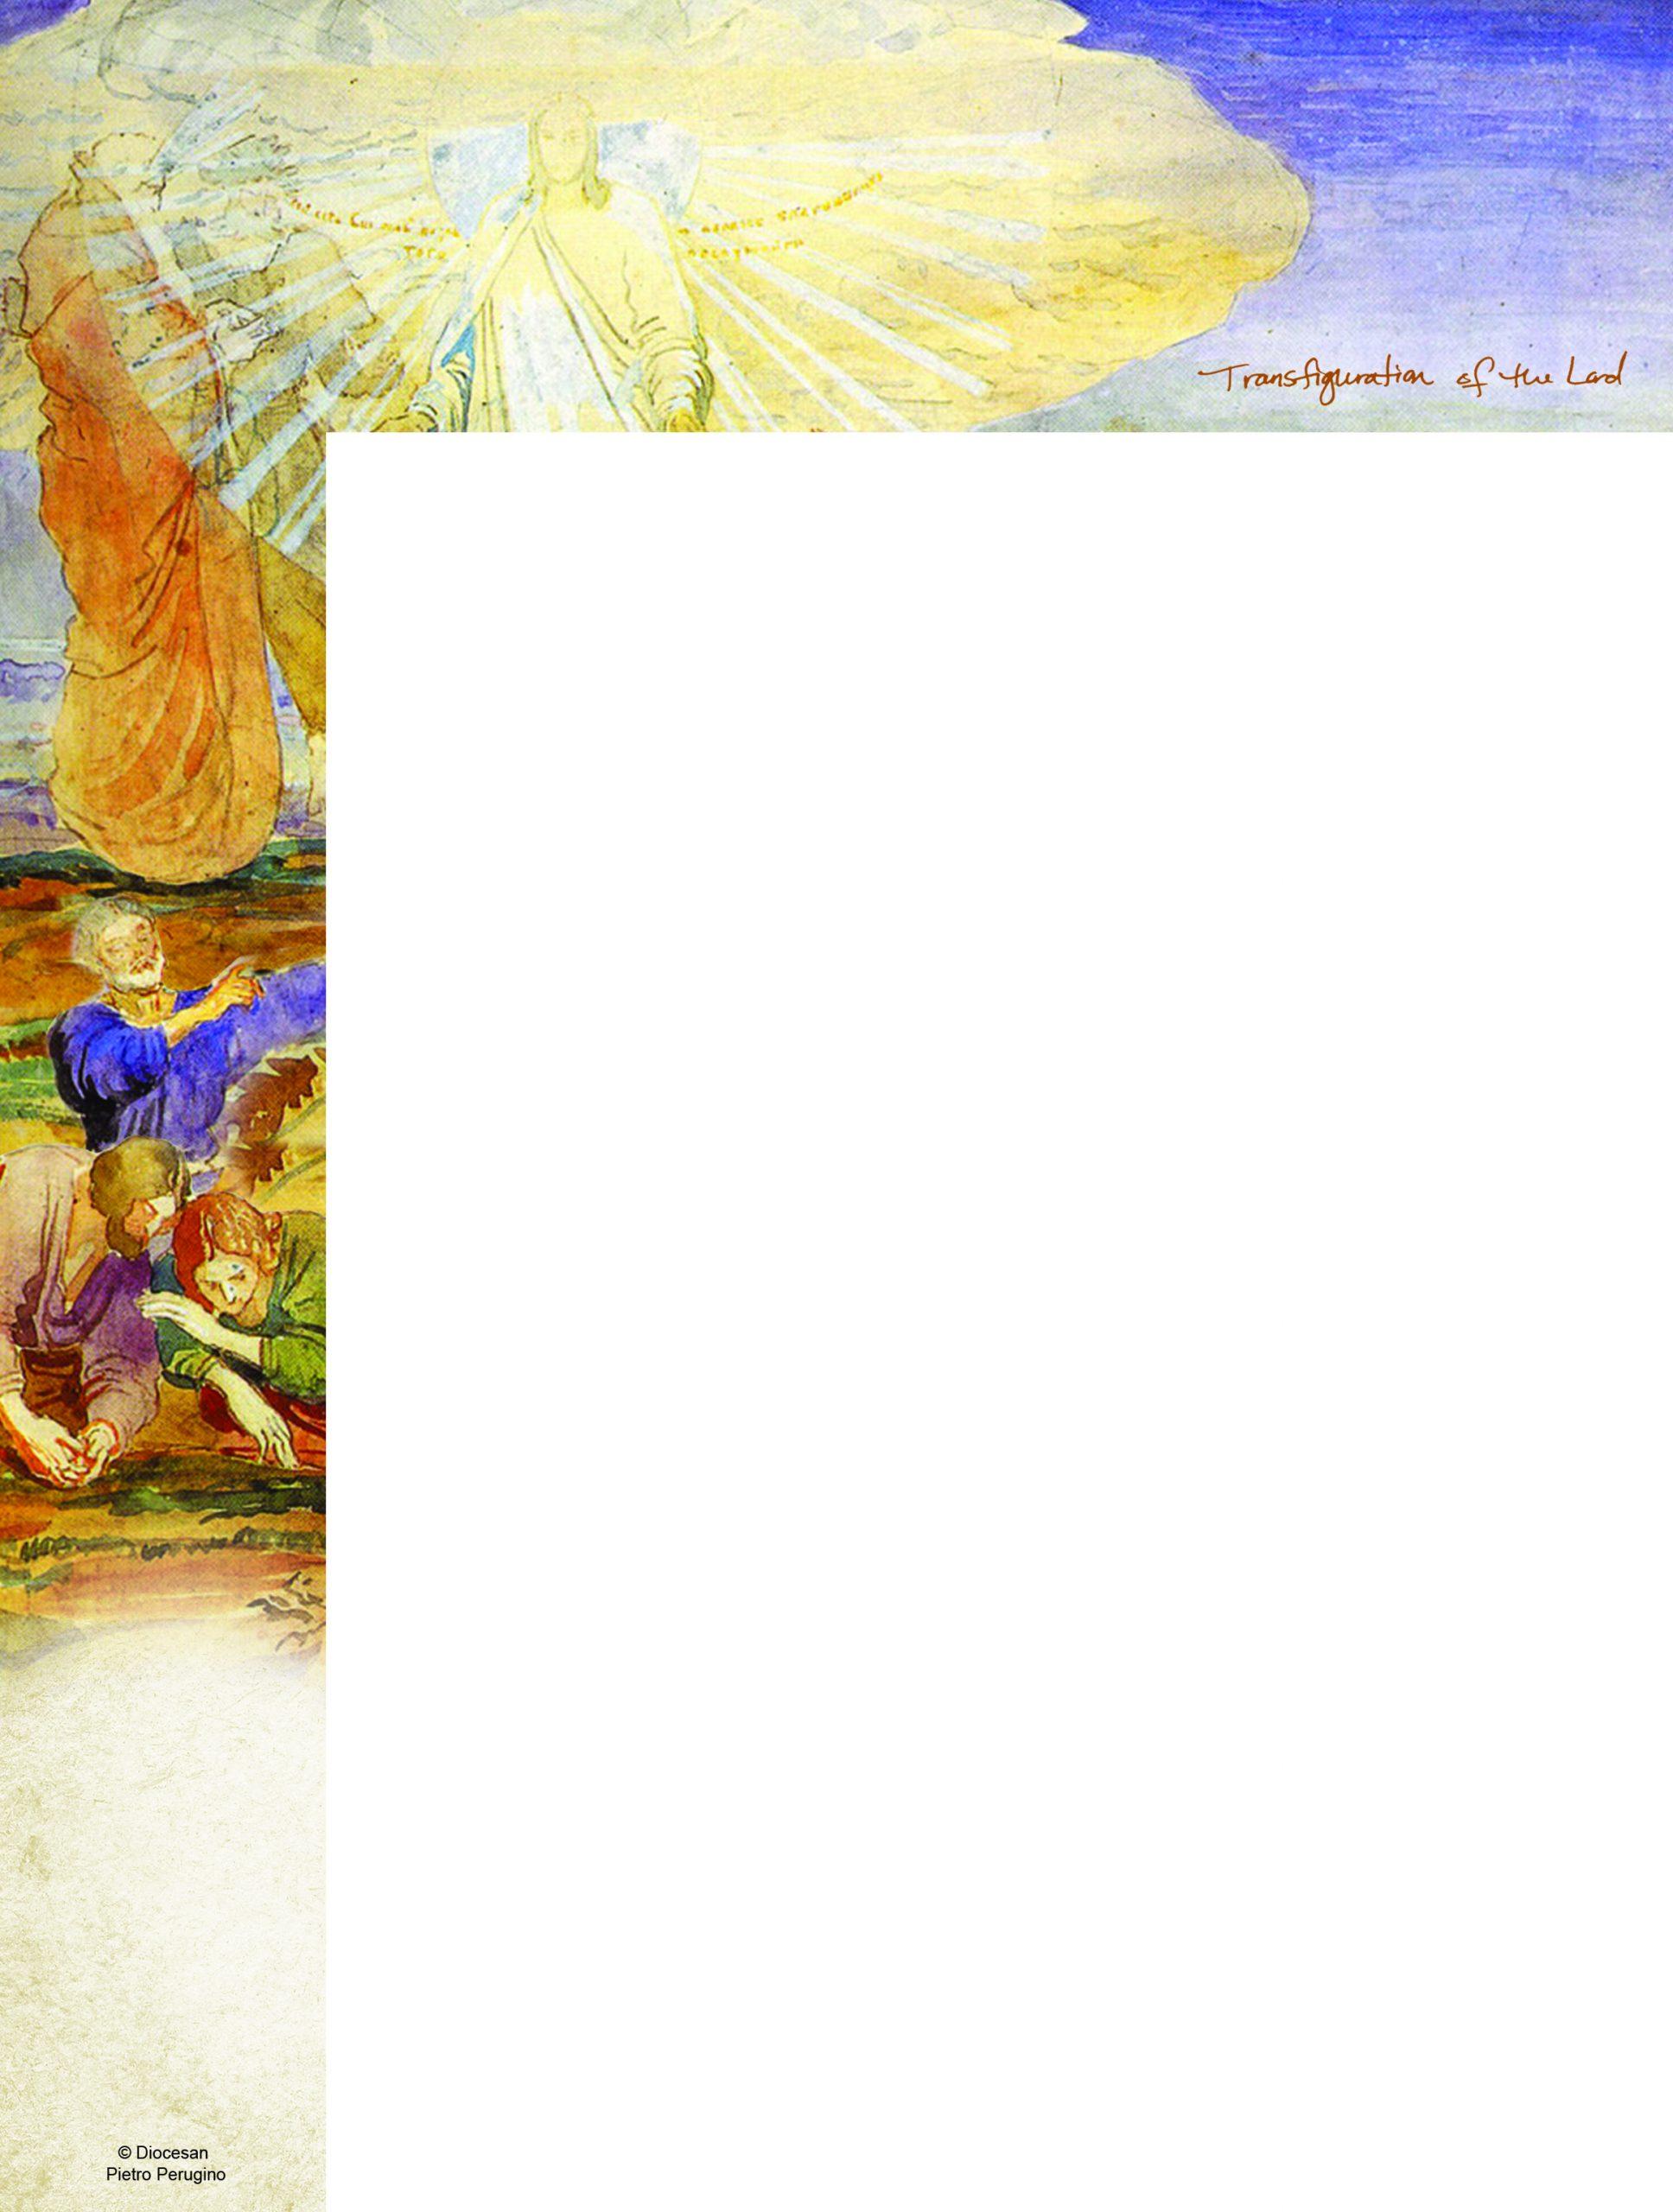 Transfiguration - Wrapper